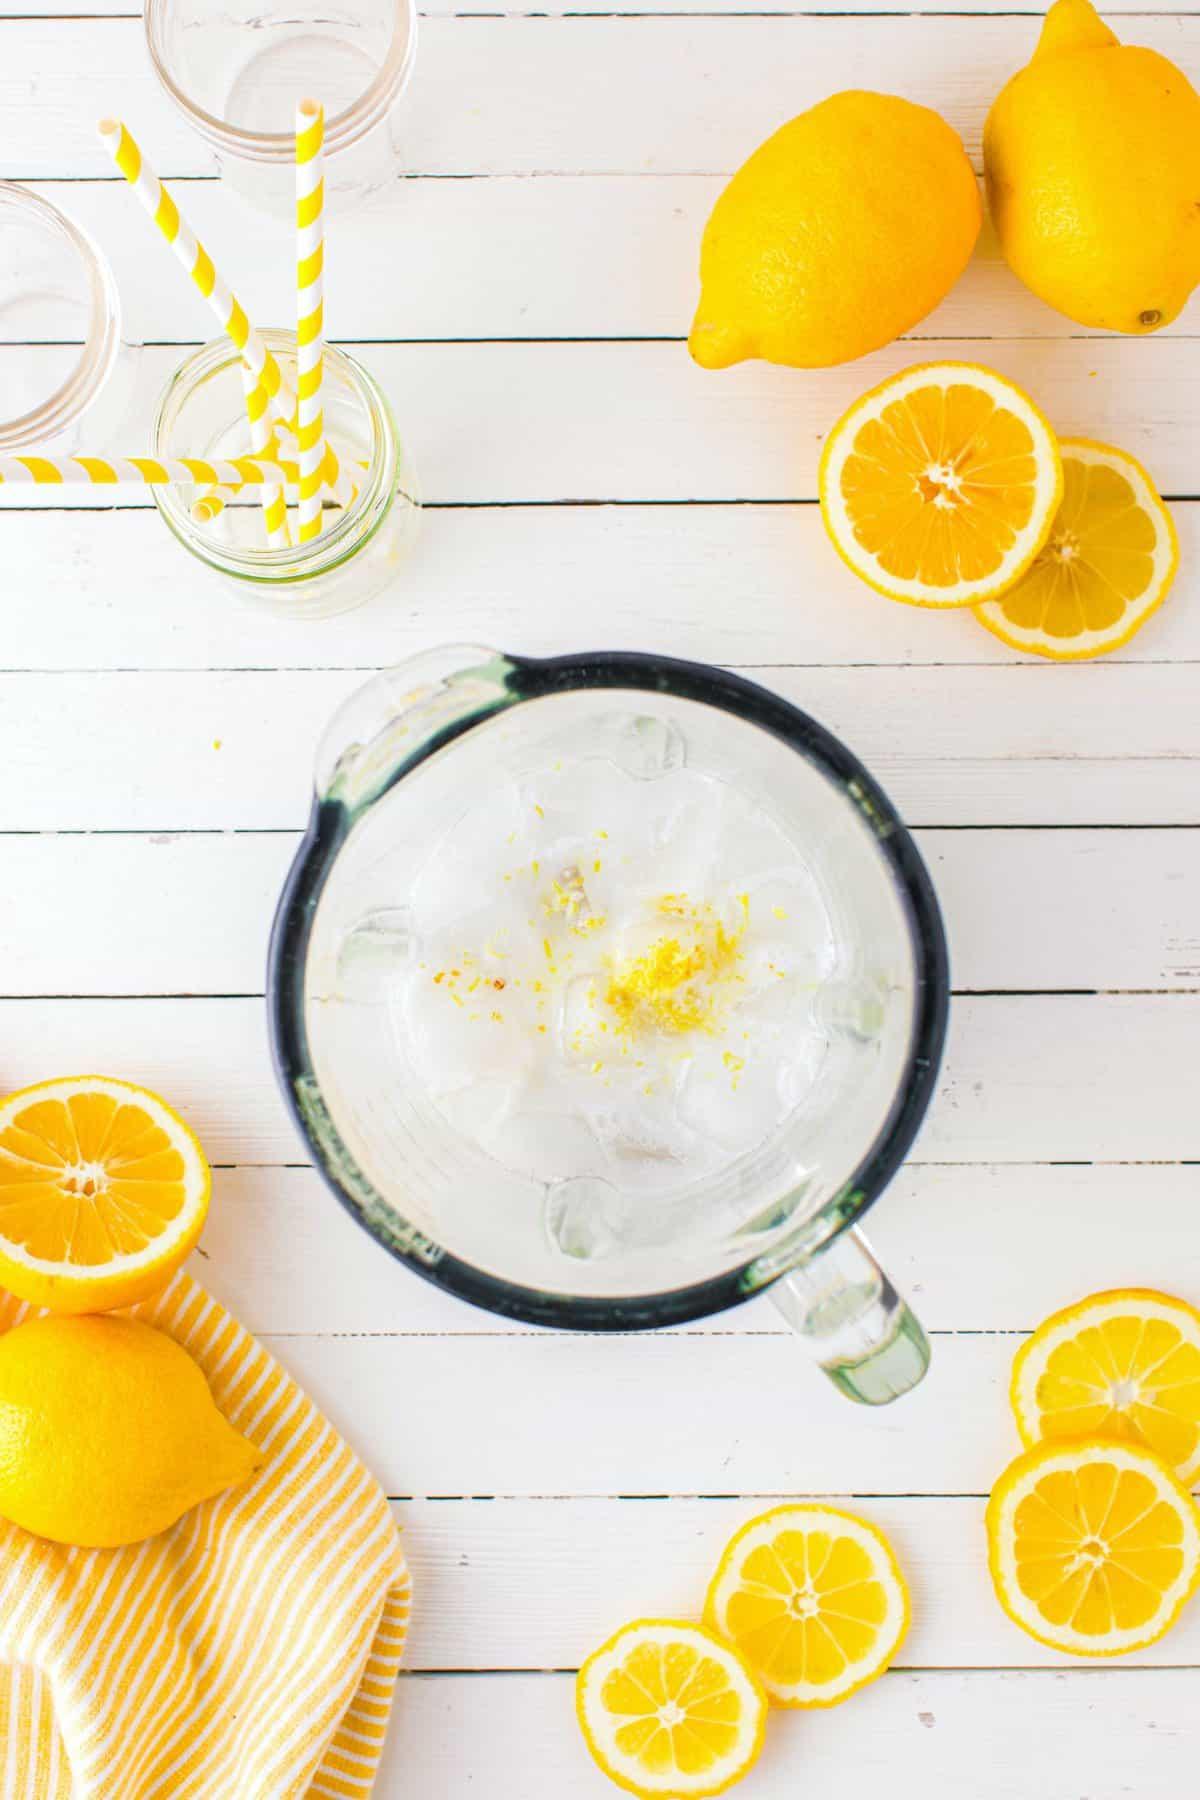 ice, coconut milk, lemon juice, zest, vanilla, and ginger in the blender